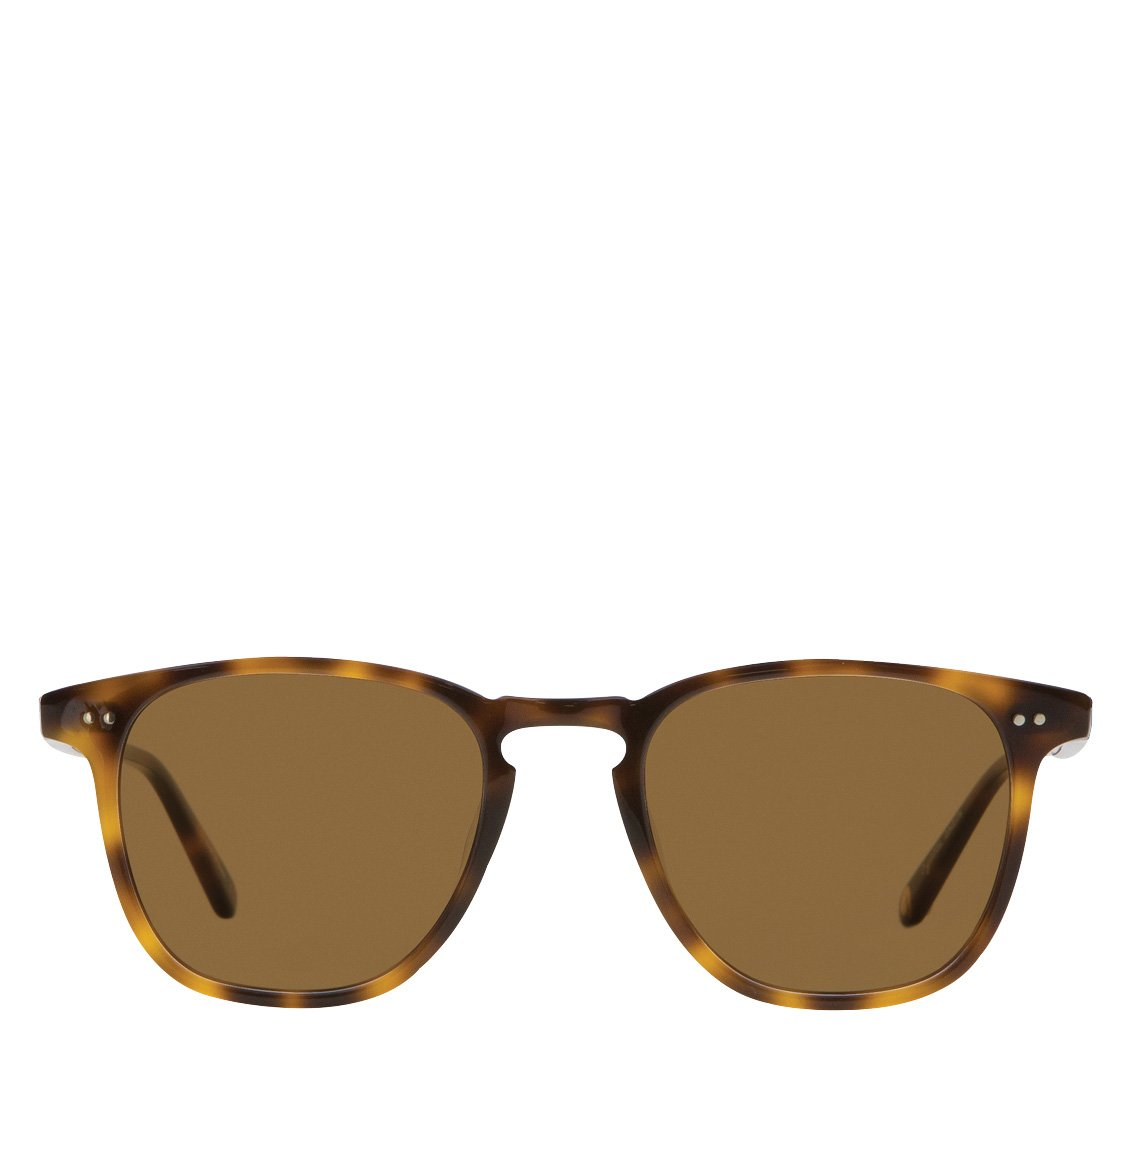 Garrett Leight Square Tortoise Γυαλιά Ηλίου